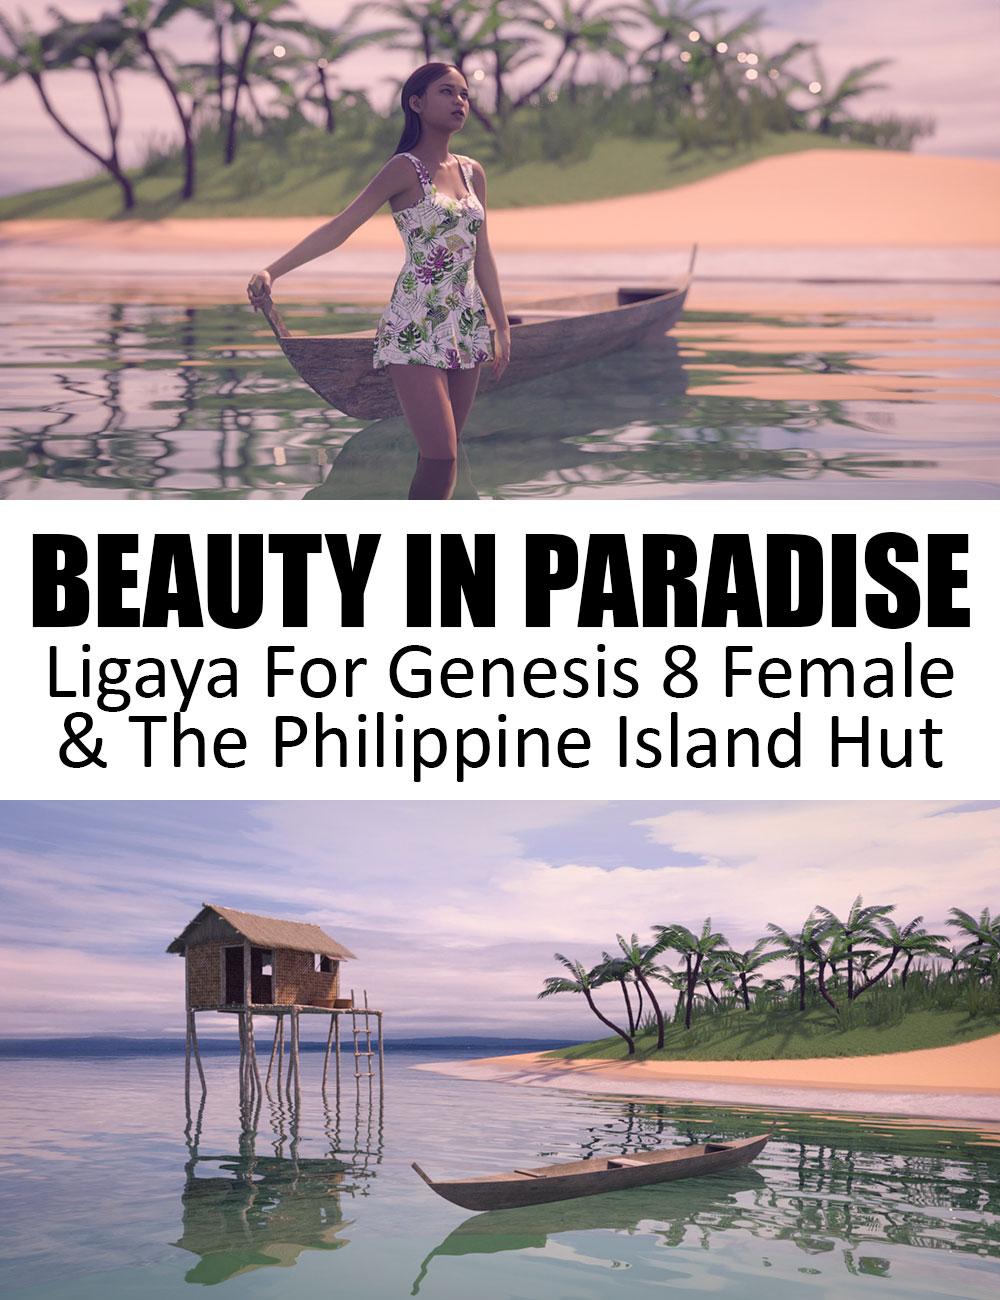 Beauty In Paradise - Ligaya And The Philippine Island Hut - Genesis 8 Female by: Dreamlight2 create HBWarloc, 3D Models by Daz 3D